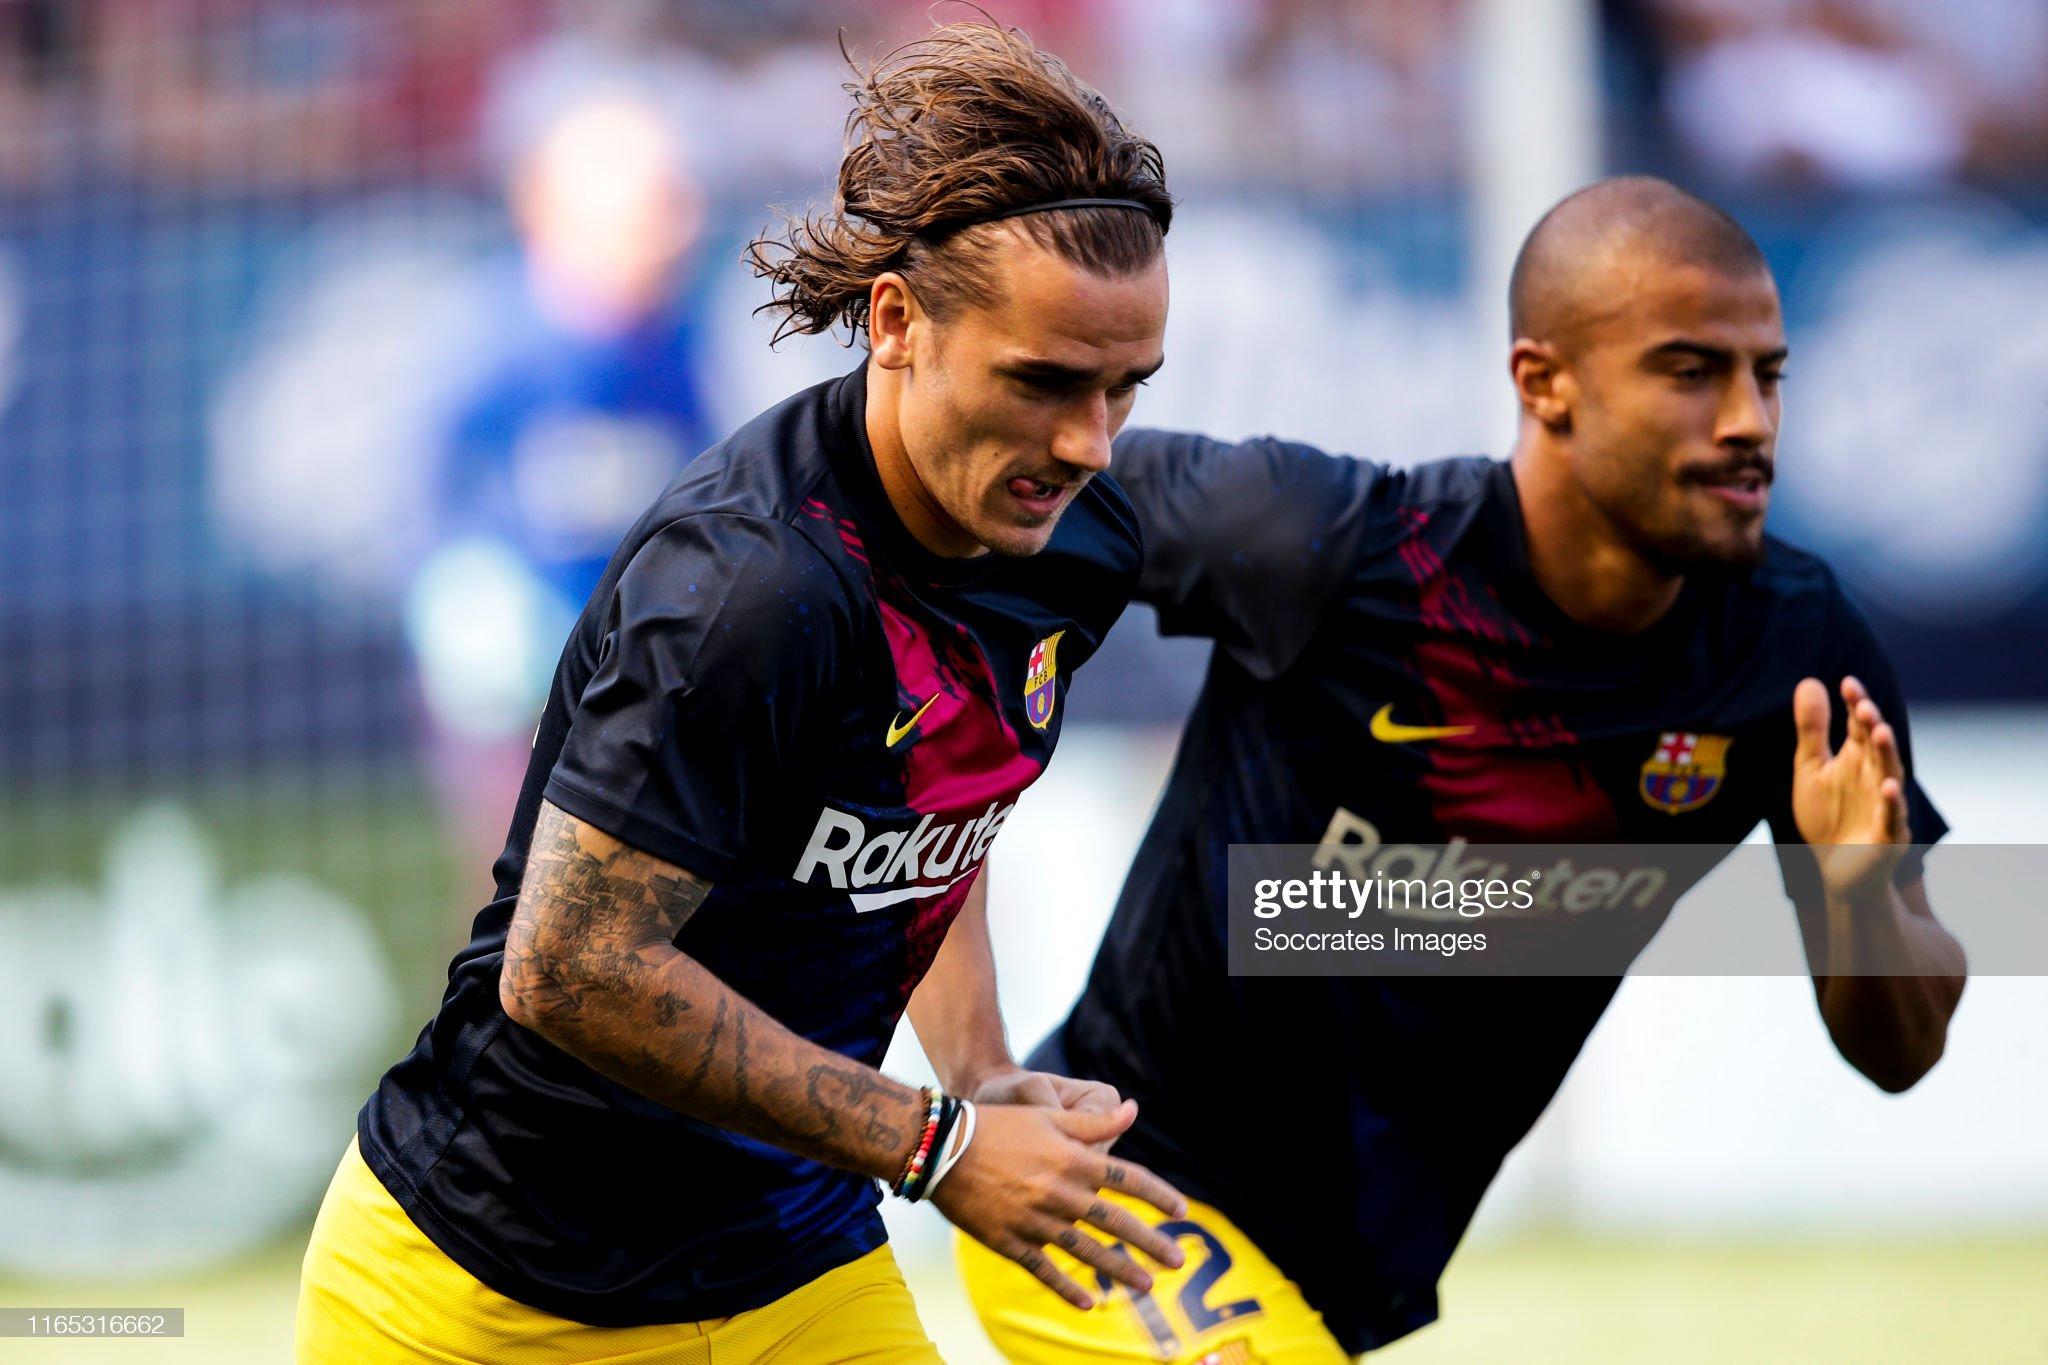 صور مباراة : أوساسونا - برشلونة 2-2 ( 31-08-2019 )  Antoine-griezmann-of-fc-barcelona-rafinha-of-fc-barcelona-during-the-picture-id1165316662?s=2048x2048